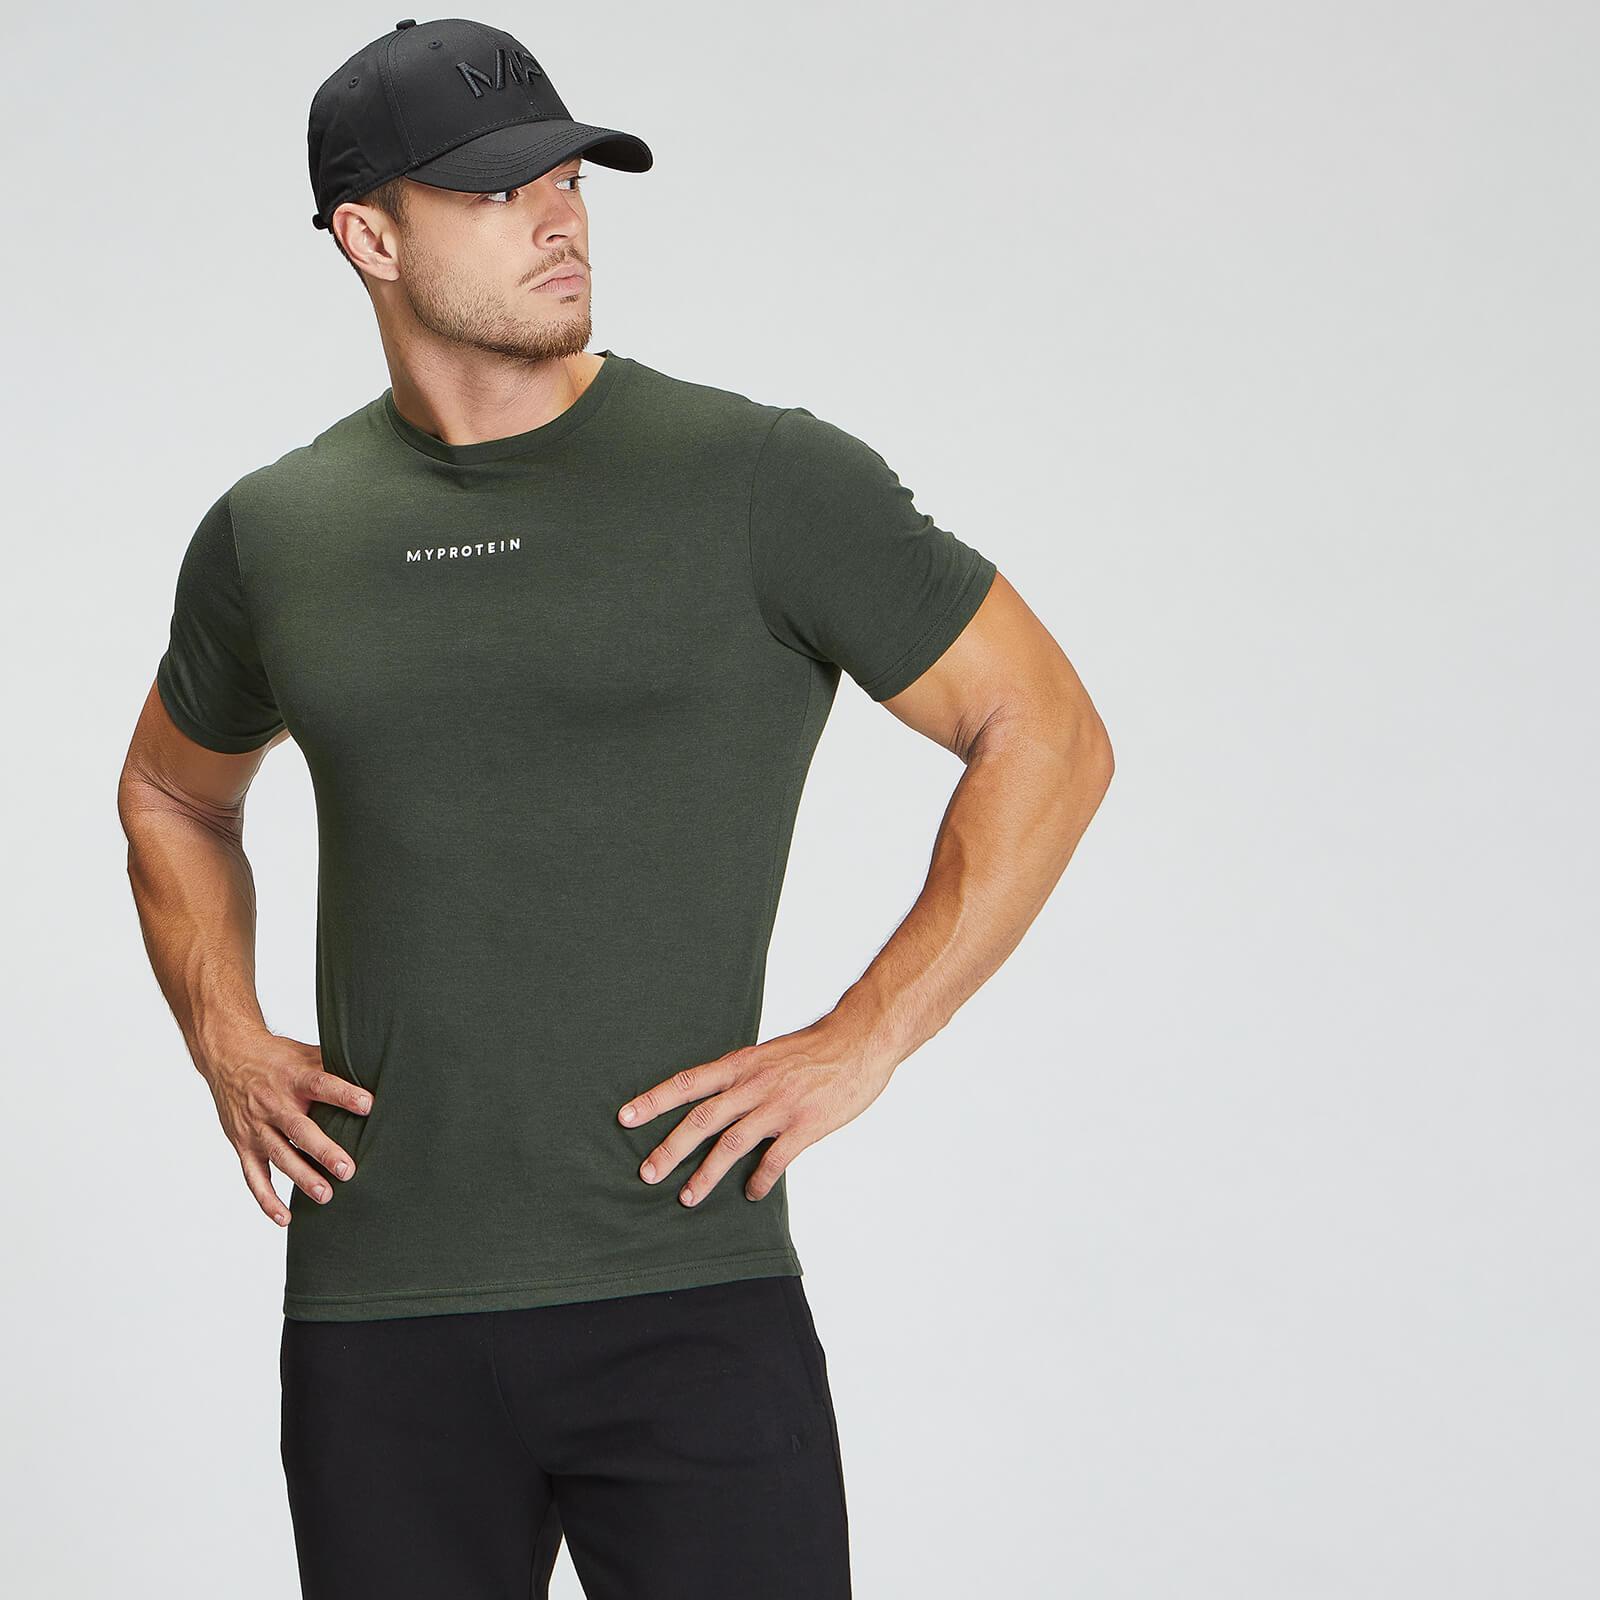 Купить MP Men's Original Short Sleeve T-Shirt - Vine Leaf - XXS, Myprotein International